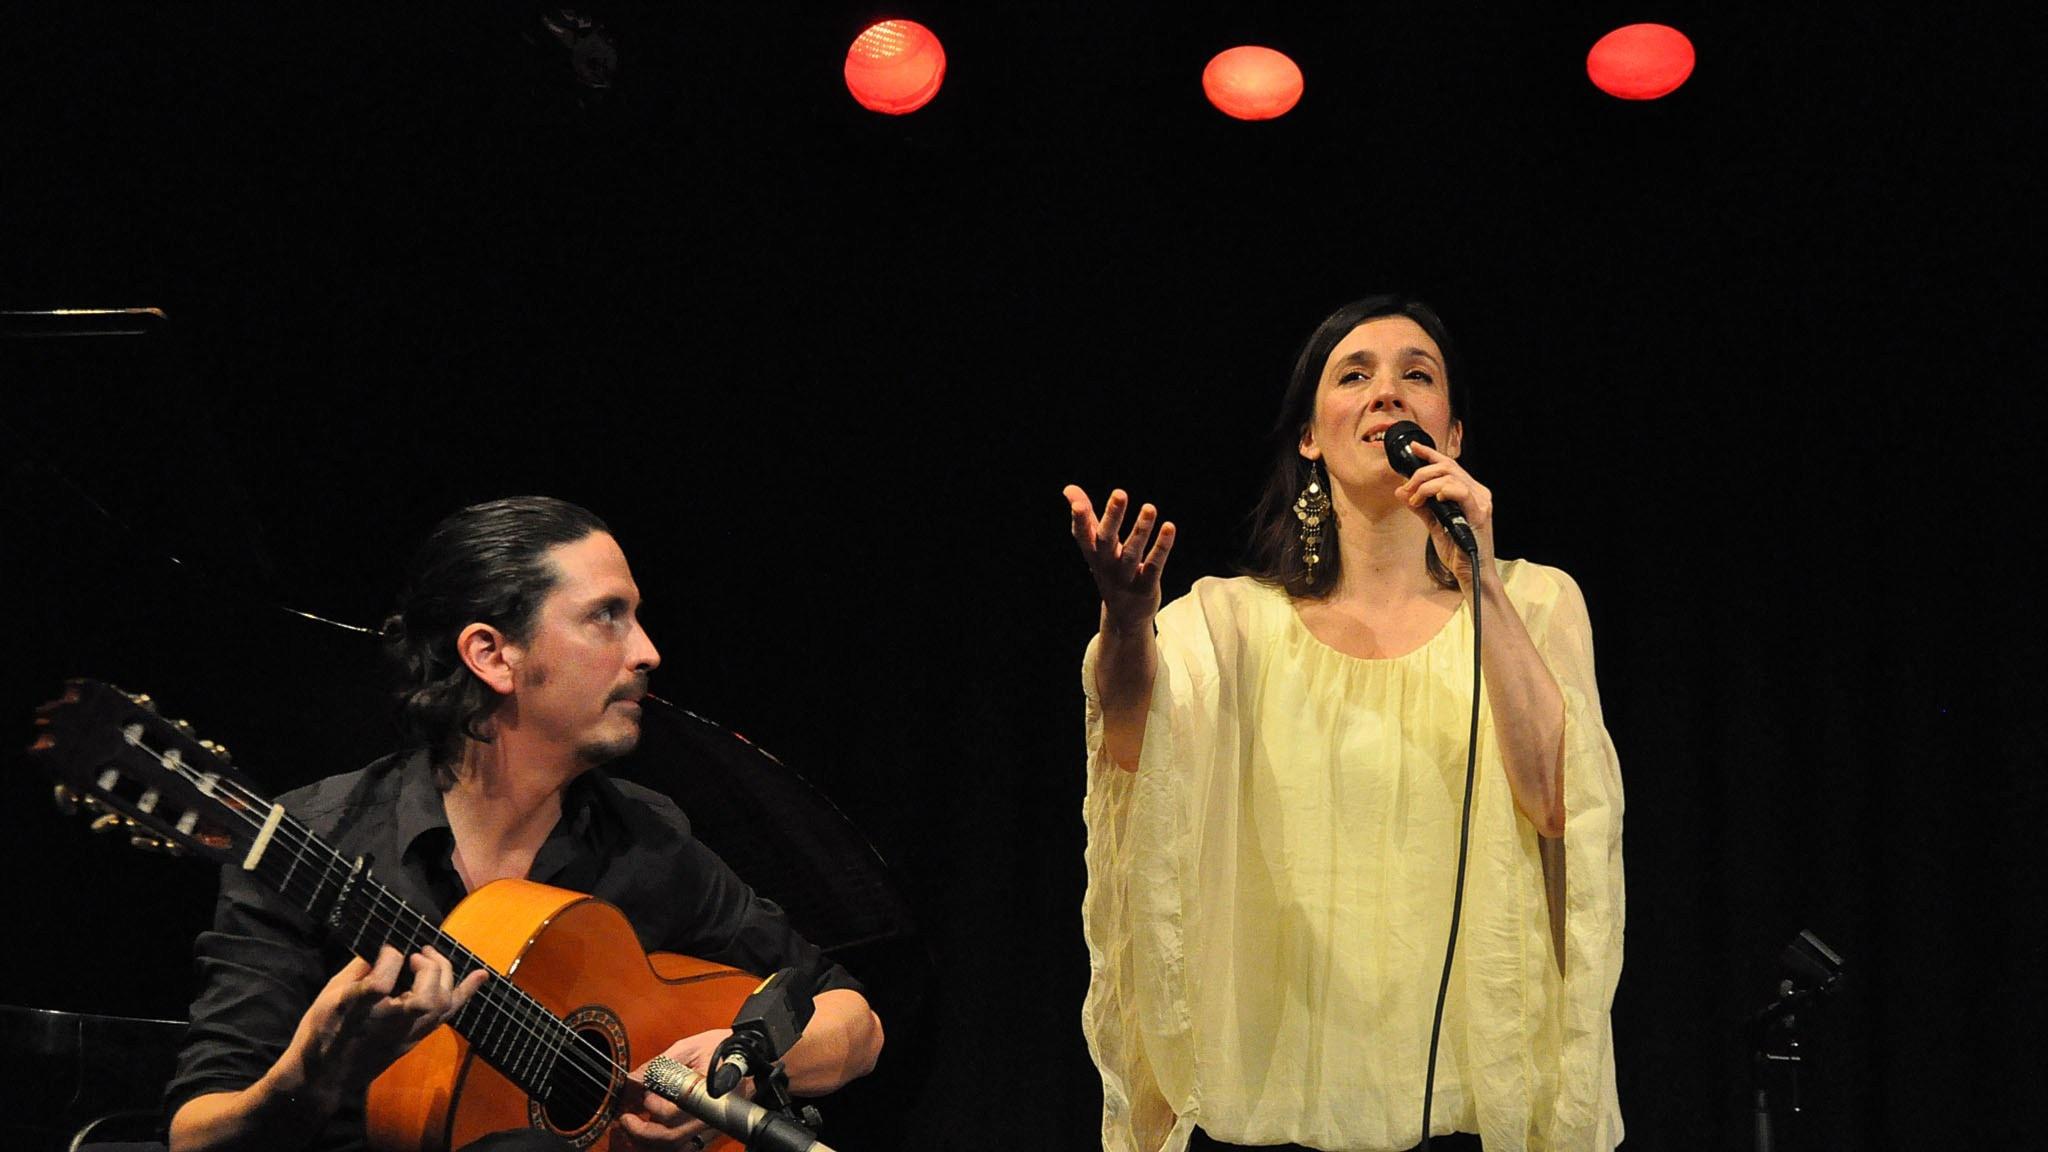 Patrik Bonnet och Sofia Berg-Böhm i samarbetet Sirocco. Foto: Mats Einarsson/Sveriges Radio